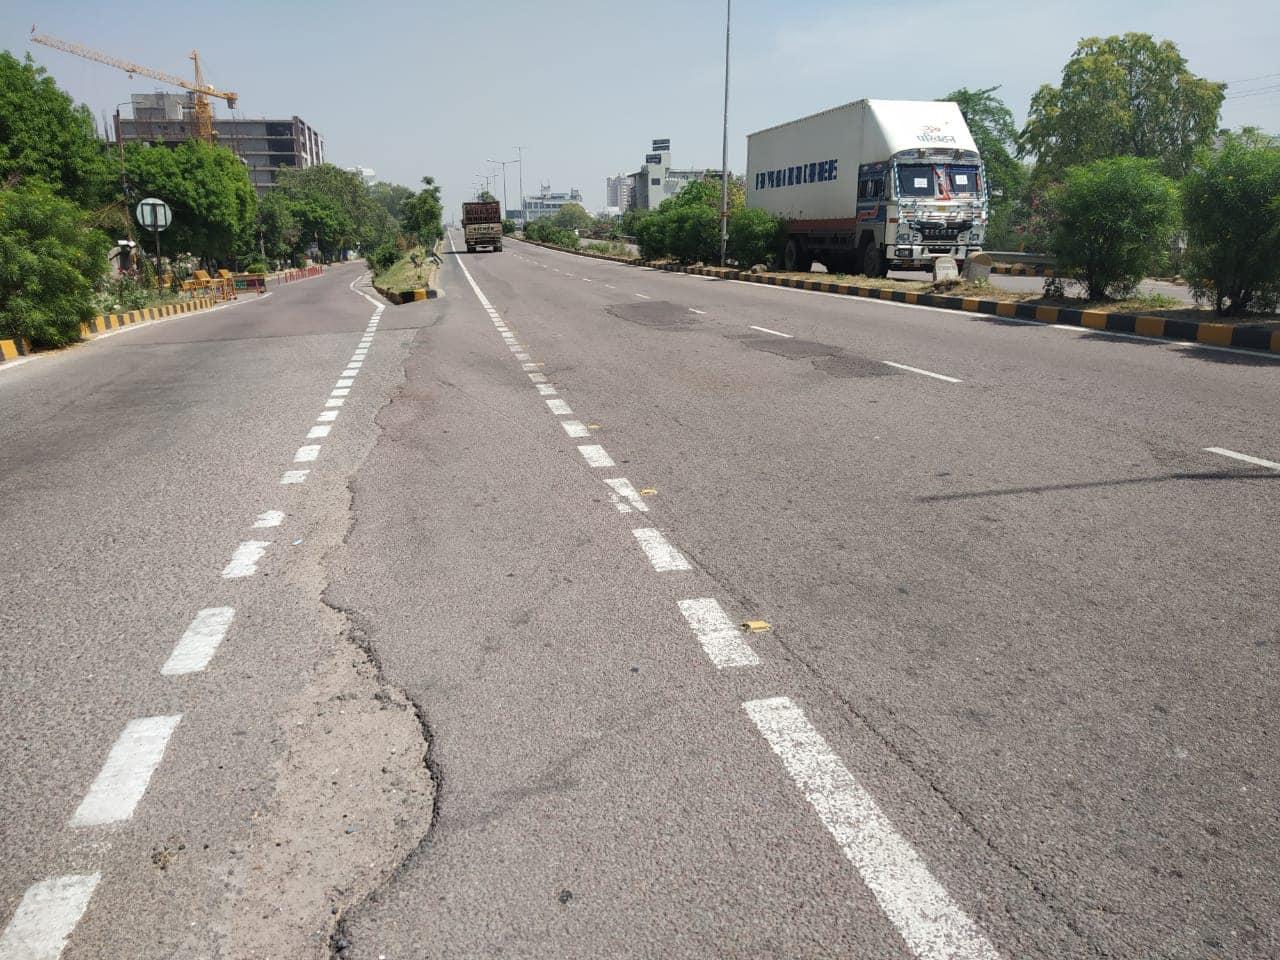 Lockdown in Gomti Nagar, Lucknow